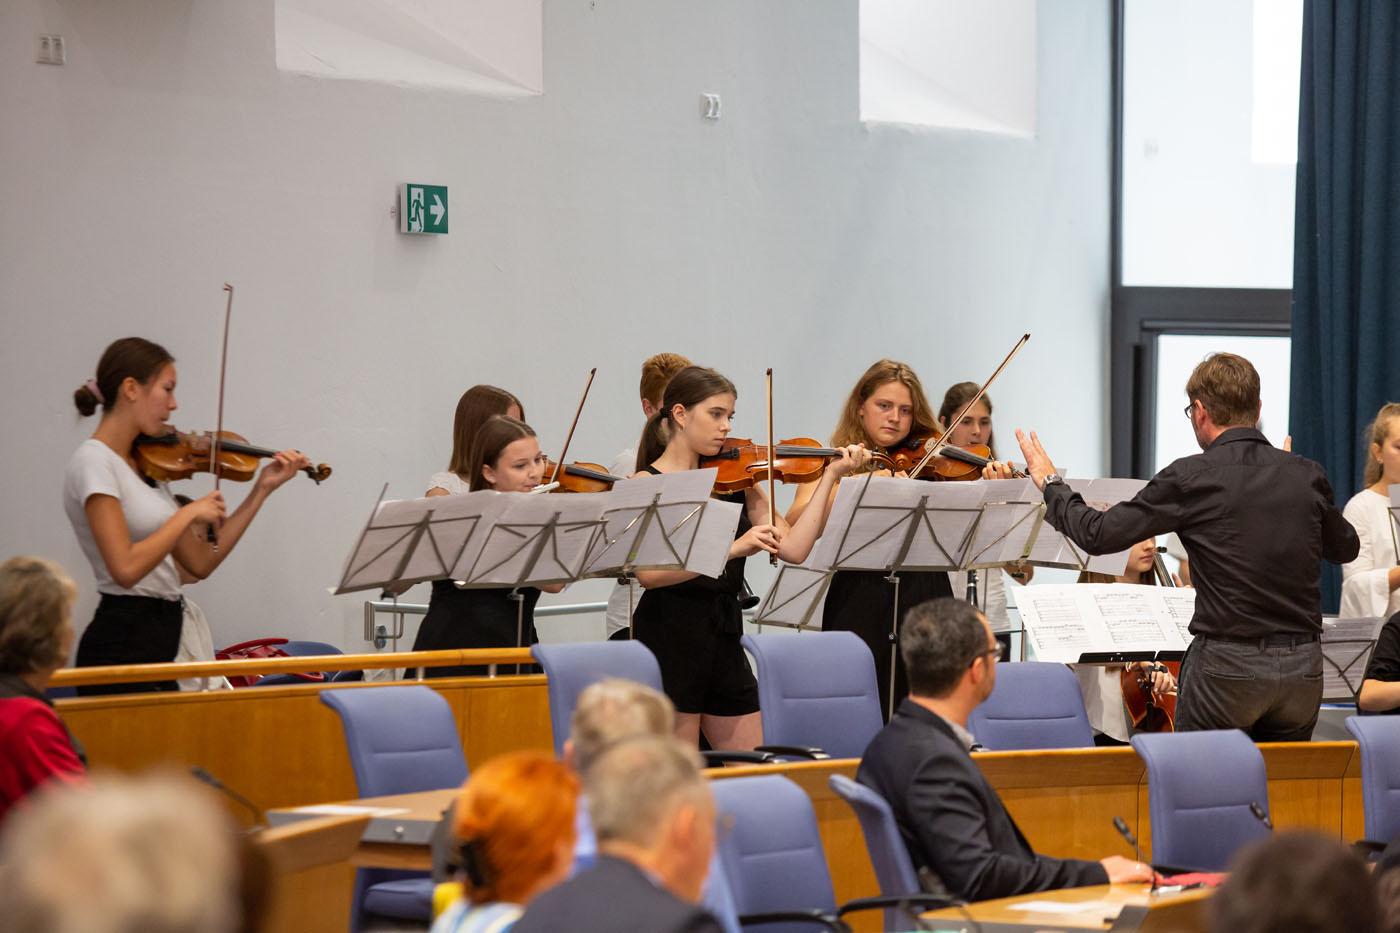 Musikalische Eröffnung durch Oberstufenschüler*innen der Freien Waldorfschule Mainz / Leitung Andreas Arneke